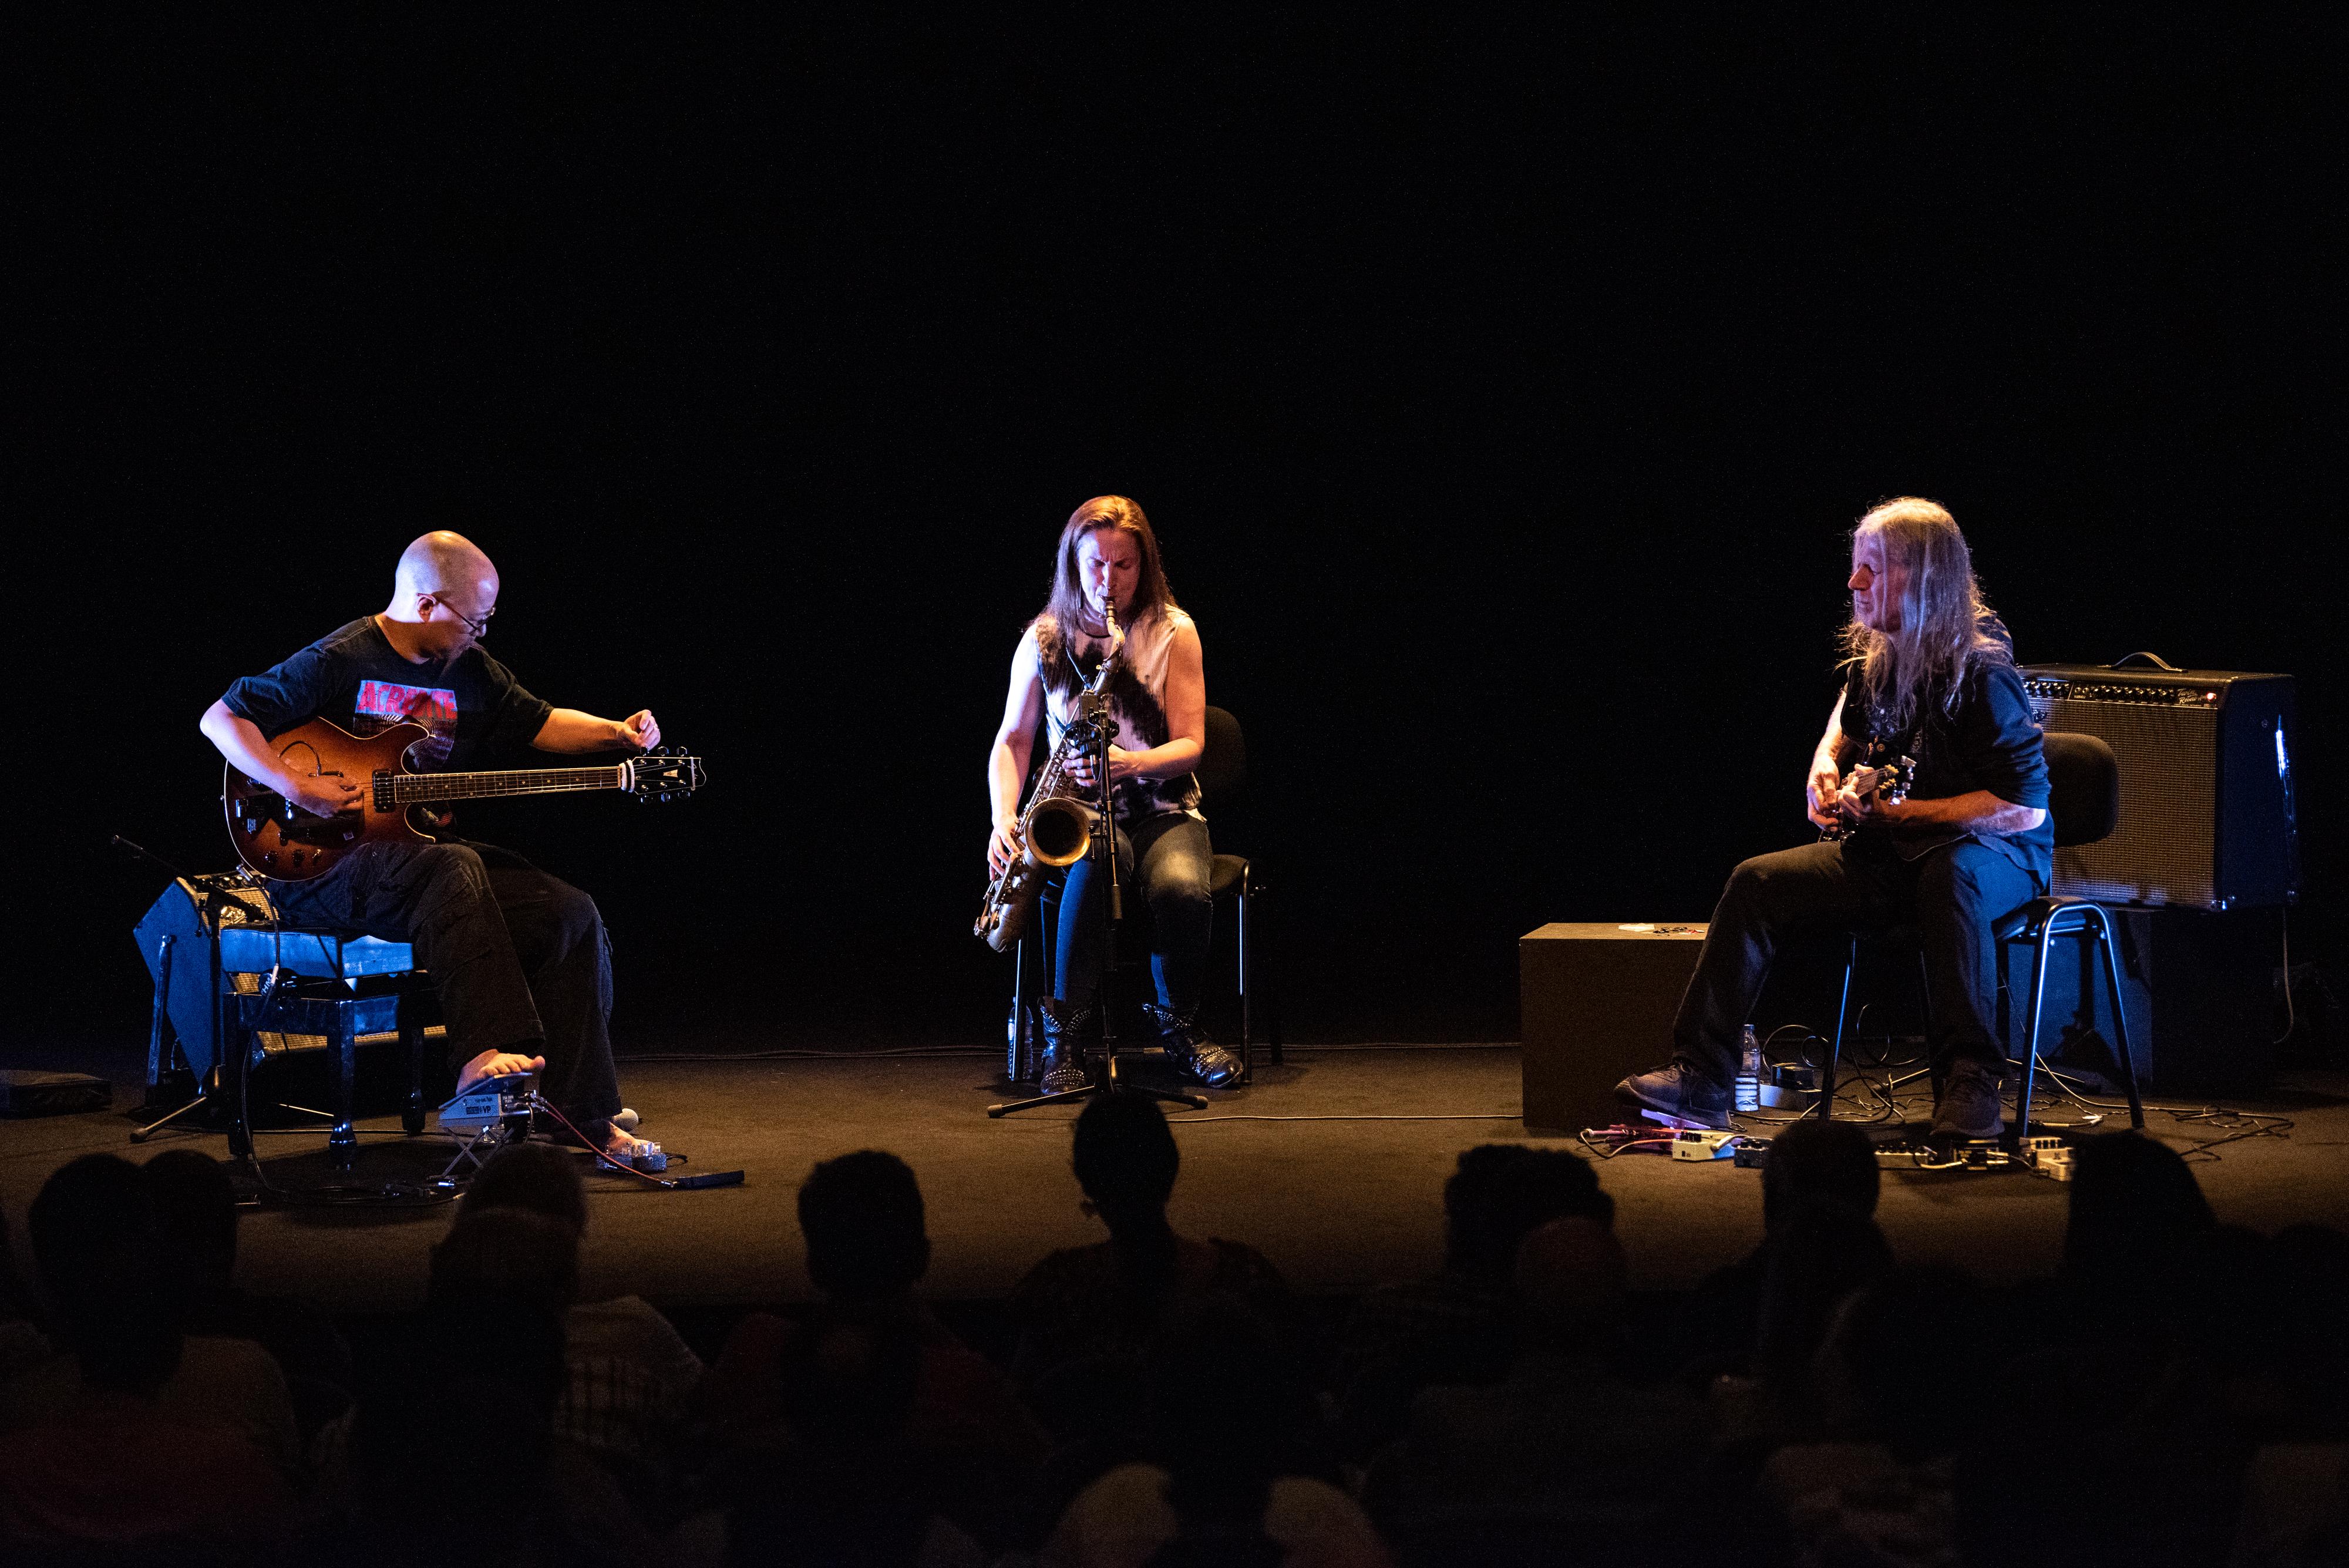 Eris 136199 (Jazz em Agosto, Lisbon, 08-11-19)